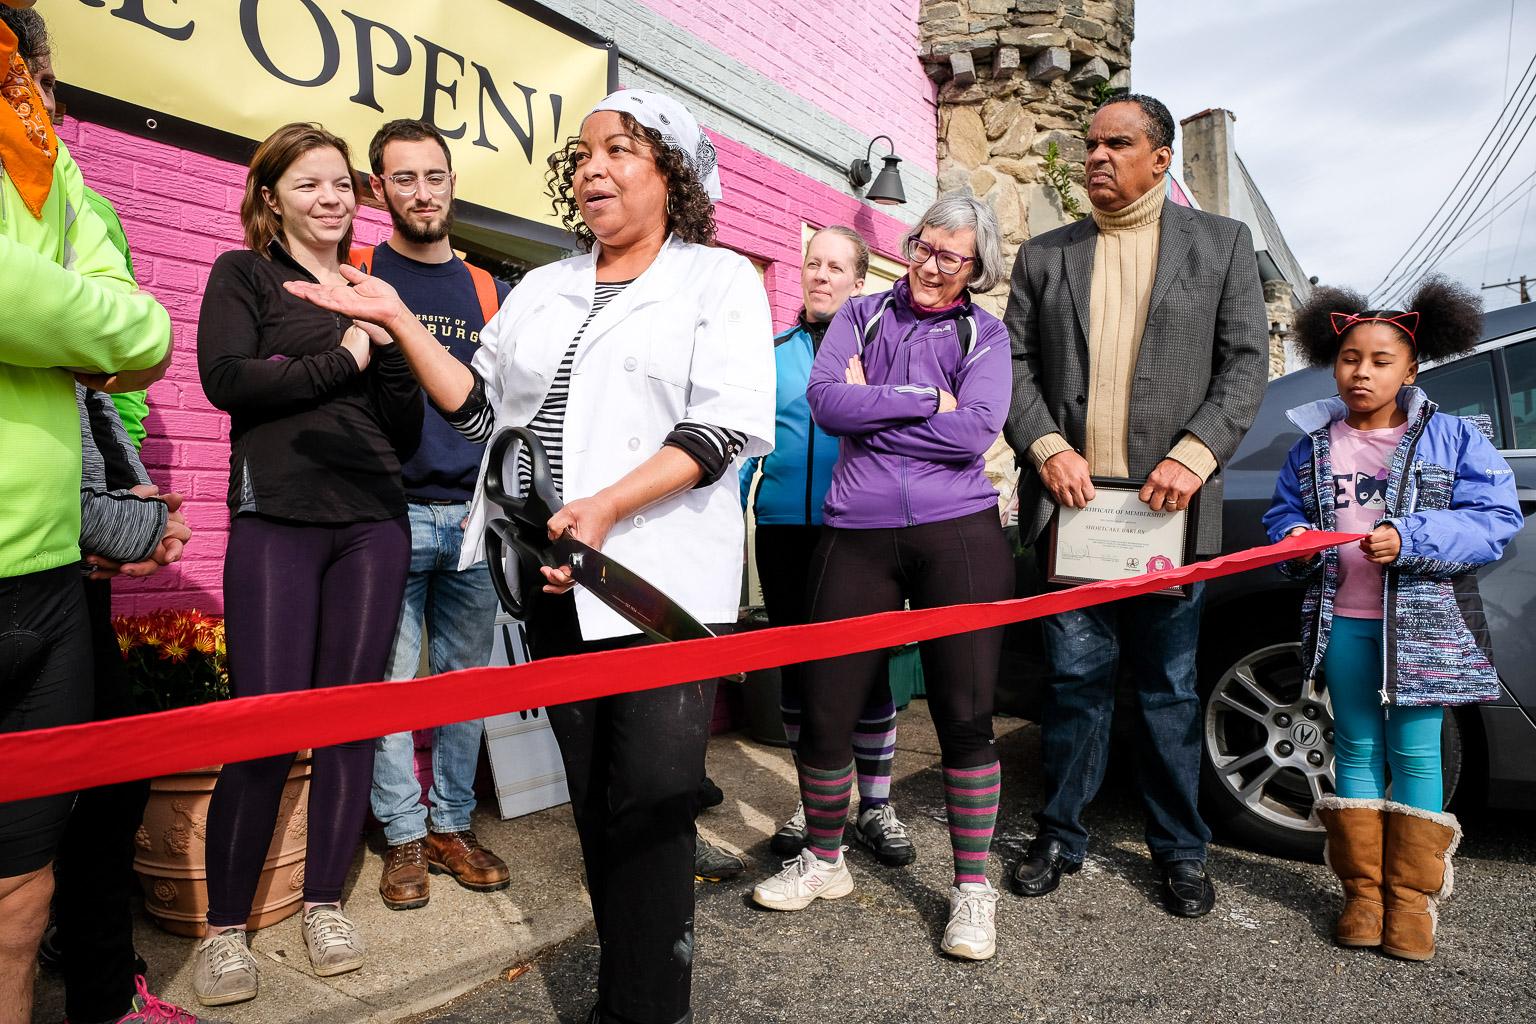 Shortcake_Reopening_11-18-17-041-Lenzy-Ruffin-Event-Photography-Washington-DC-Fuji-X-T2.jpg